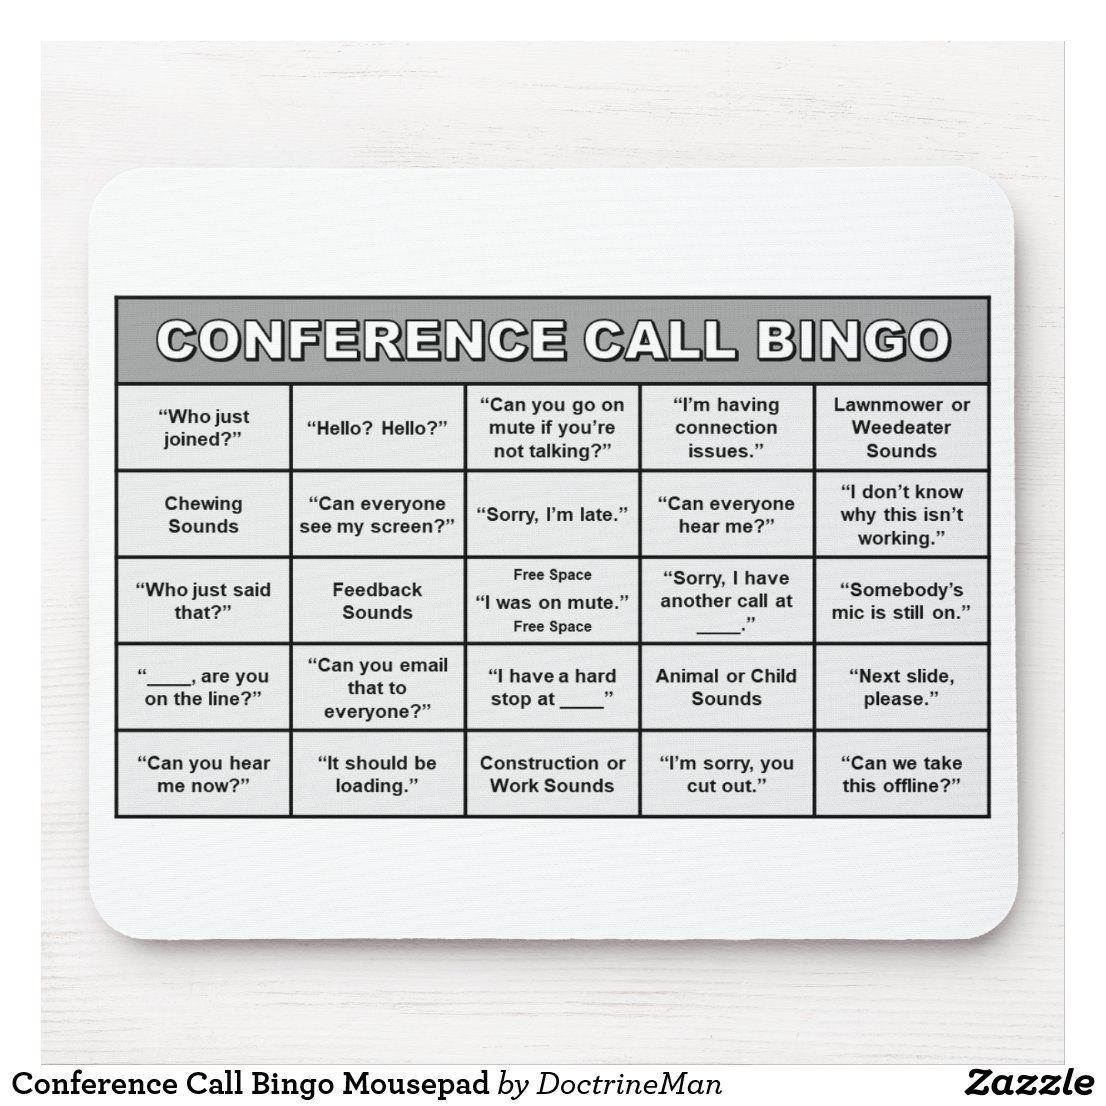 Conference Call Bingo Mousepad